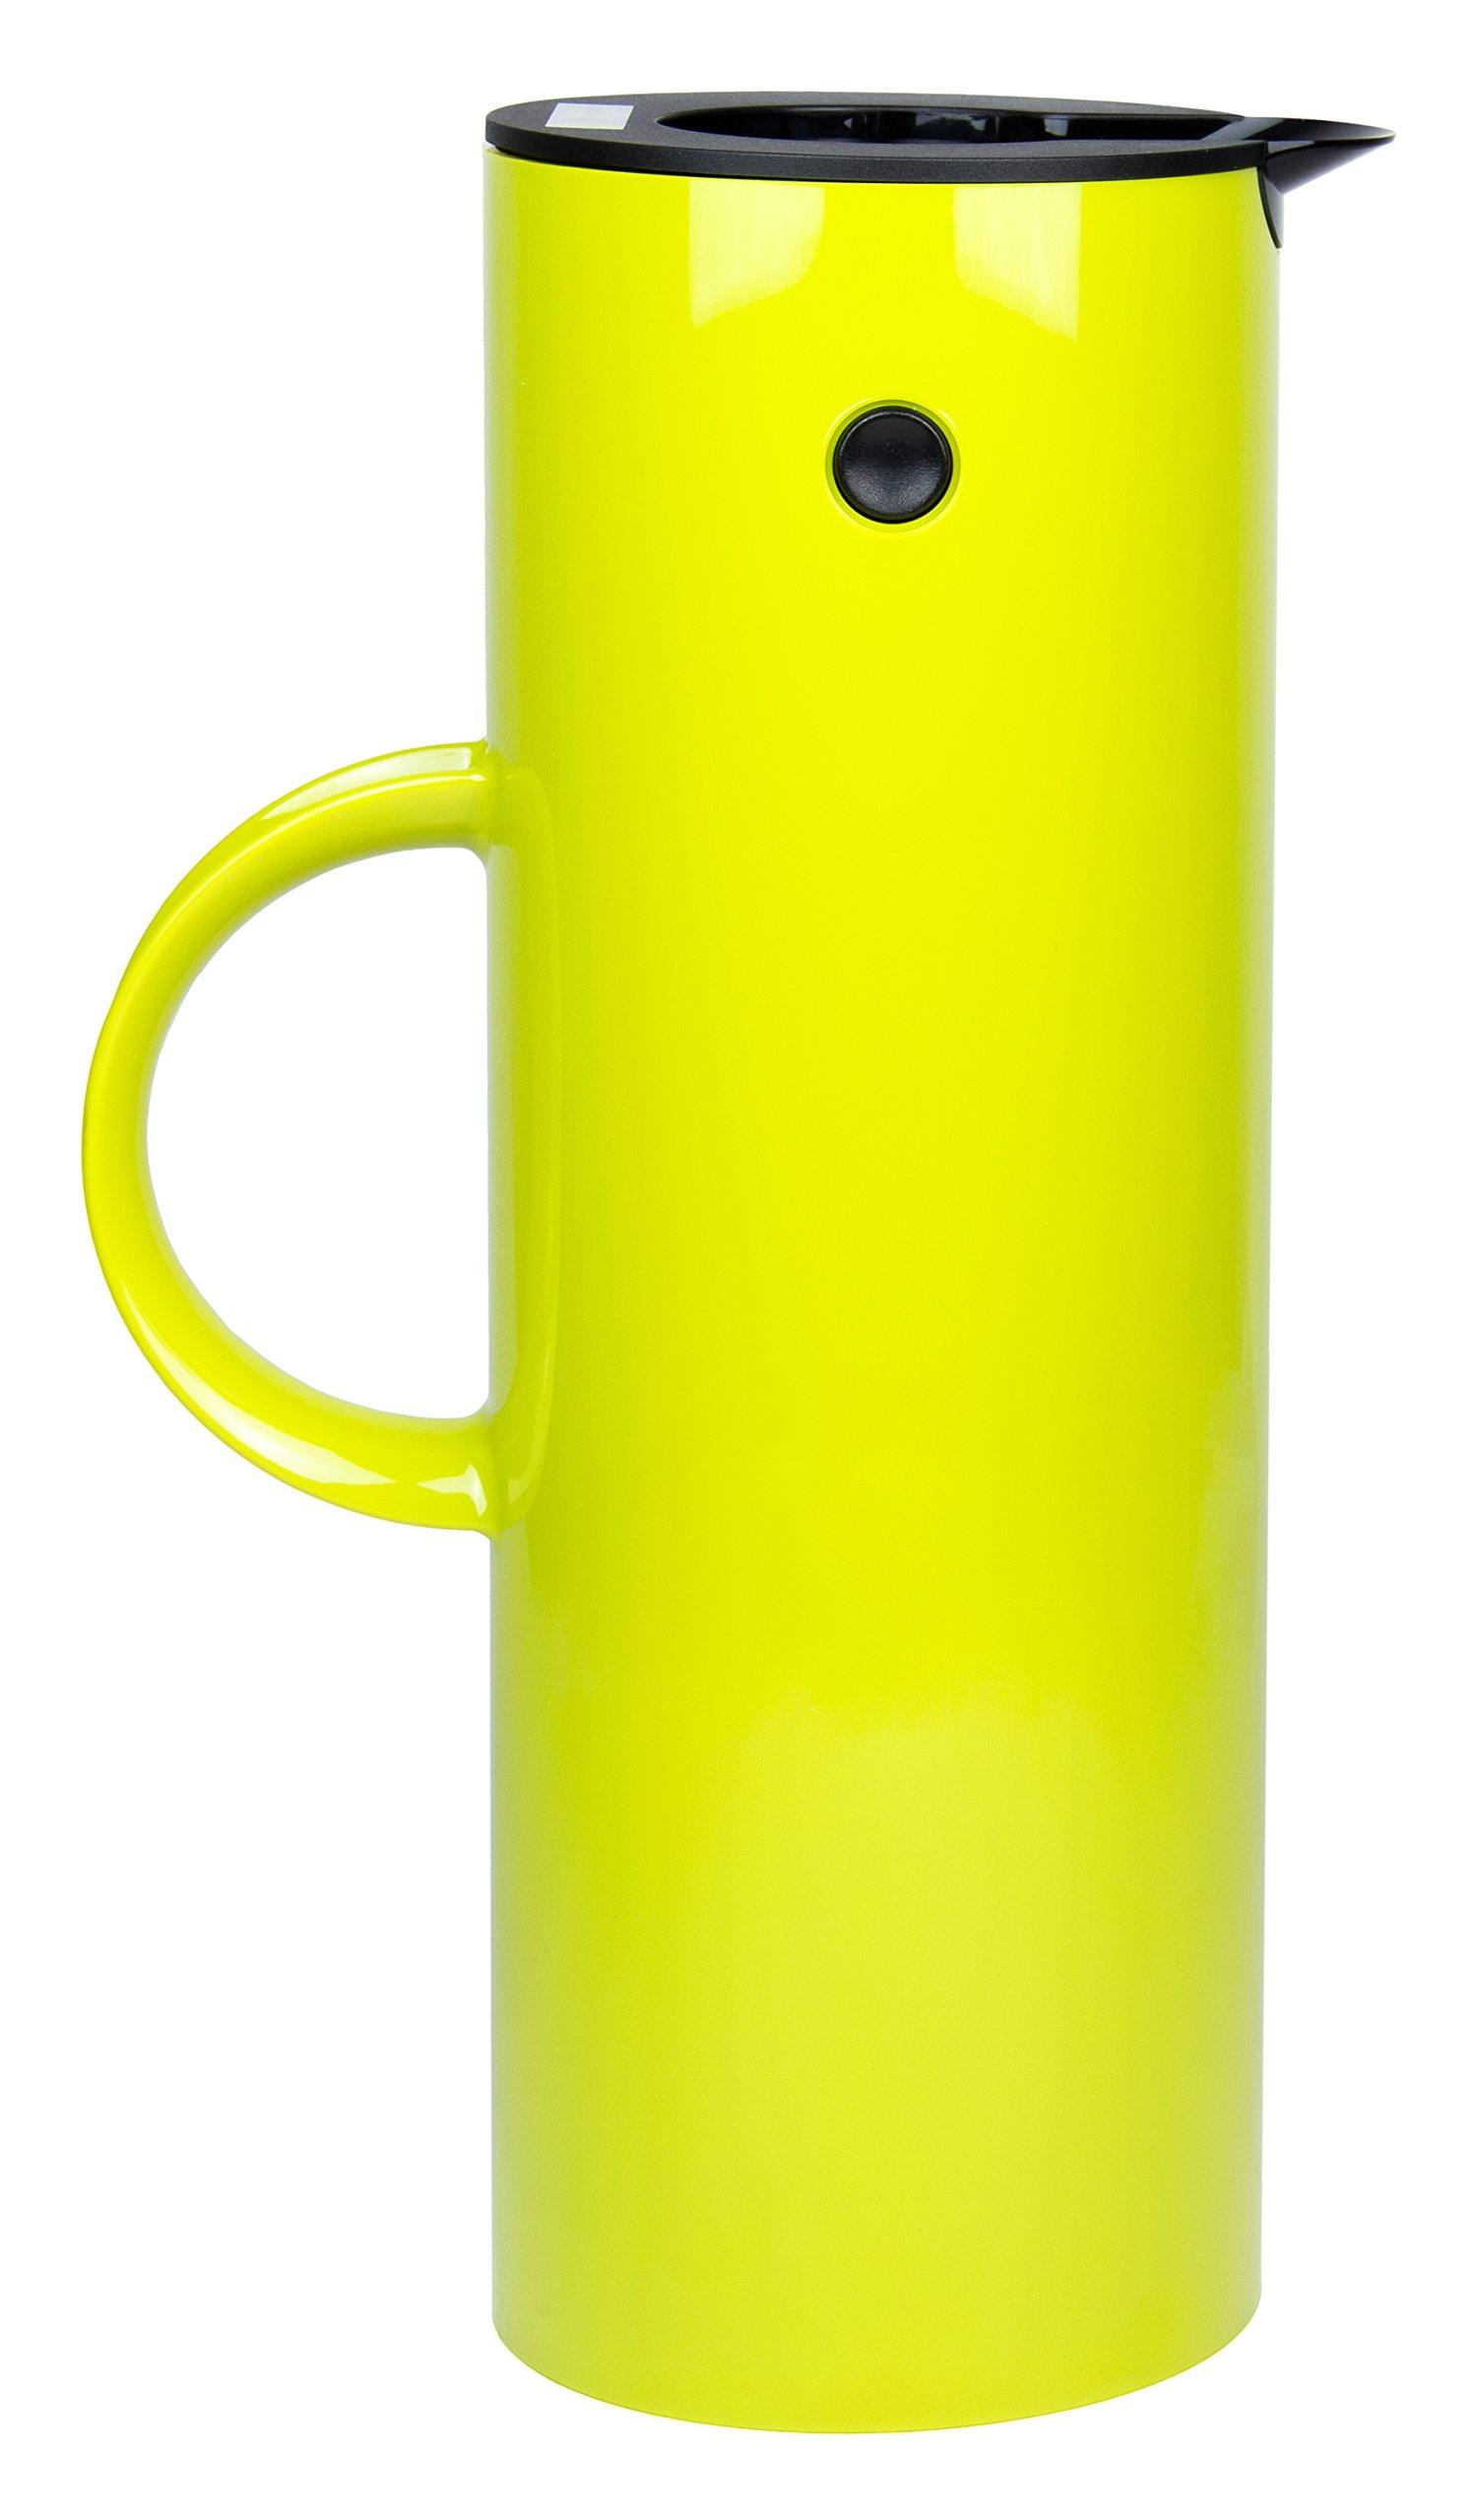 Stelton EM77 Vacuum Jug, 33.8 oz (Lime)